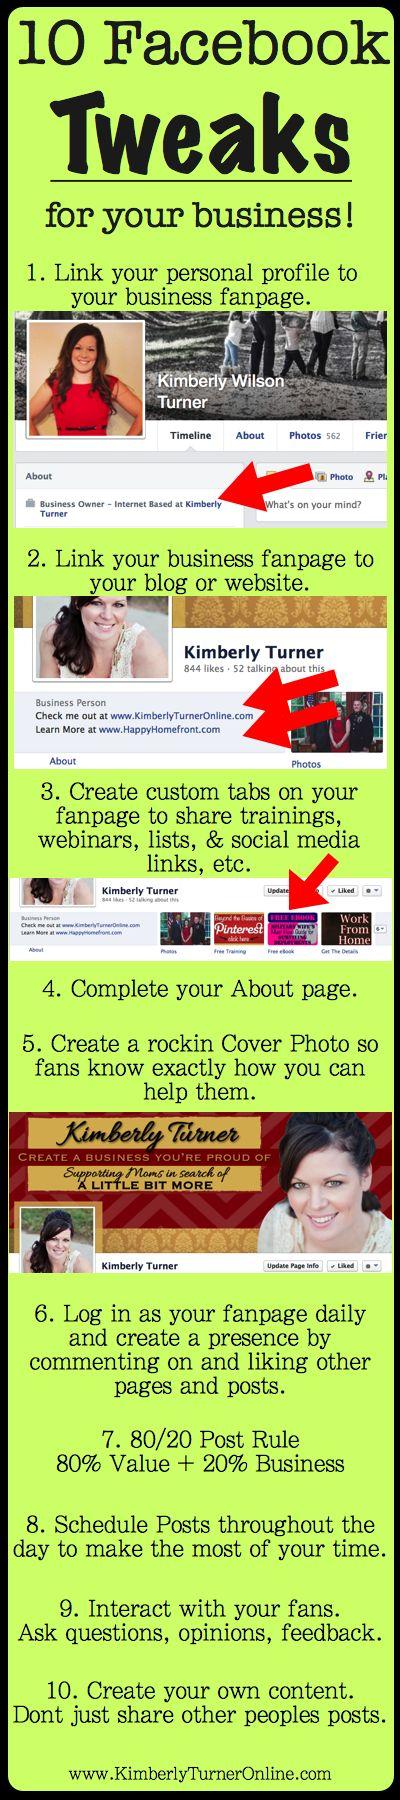 10 Facebook Tweaks for your Business